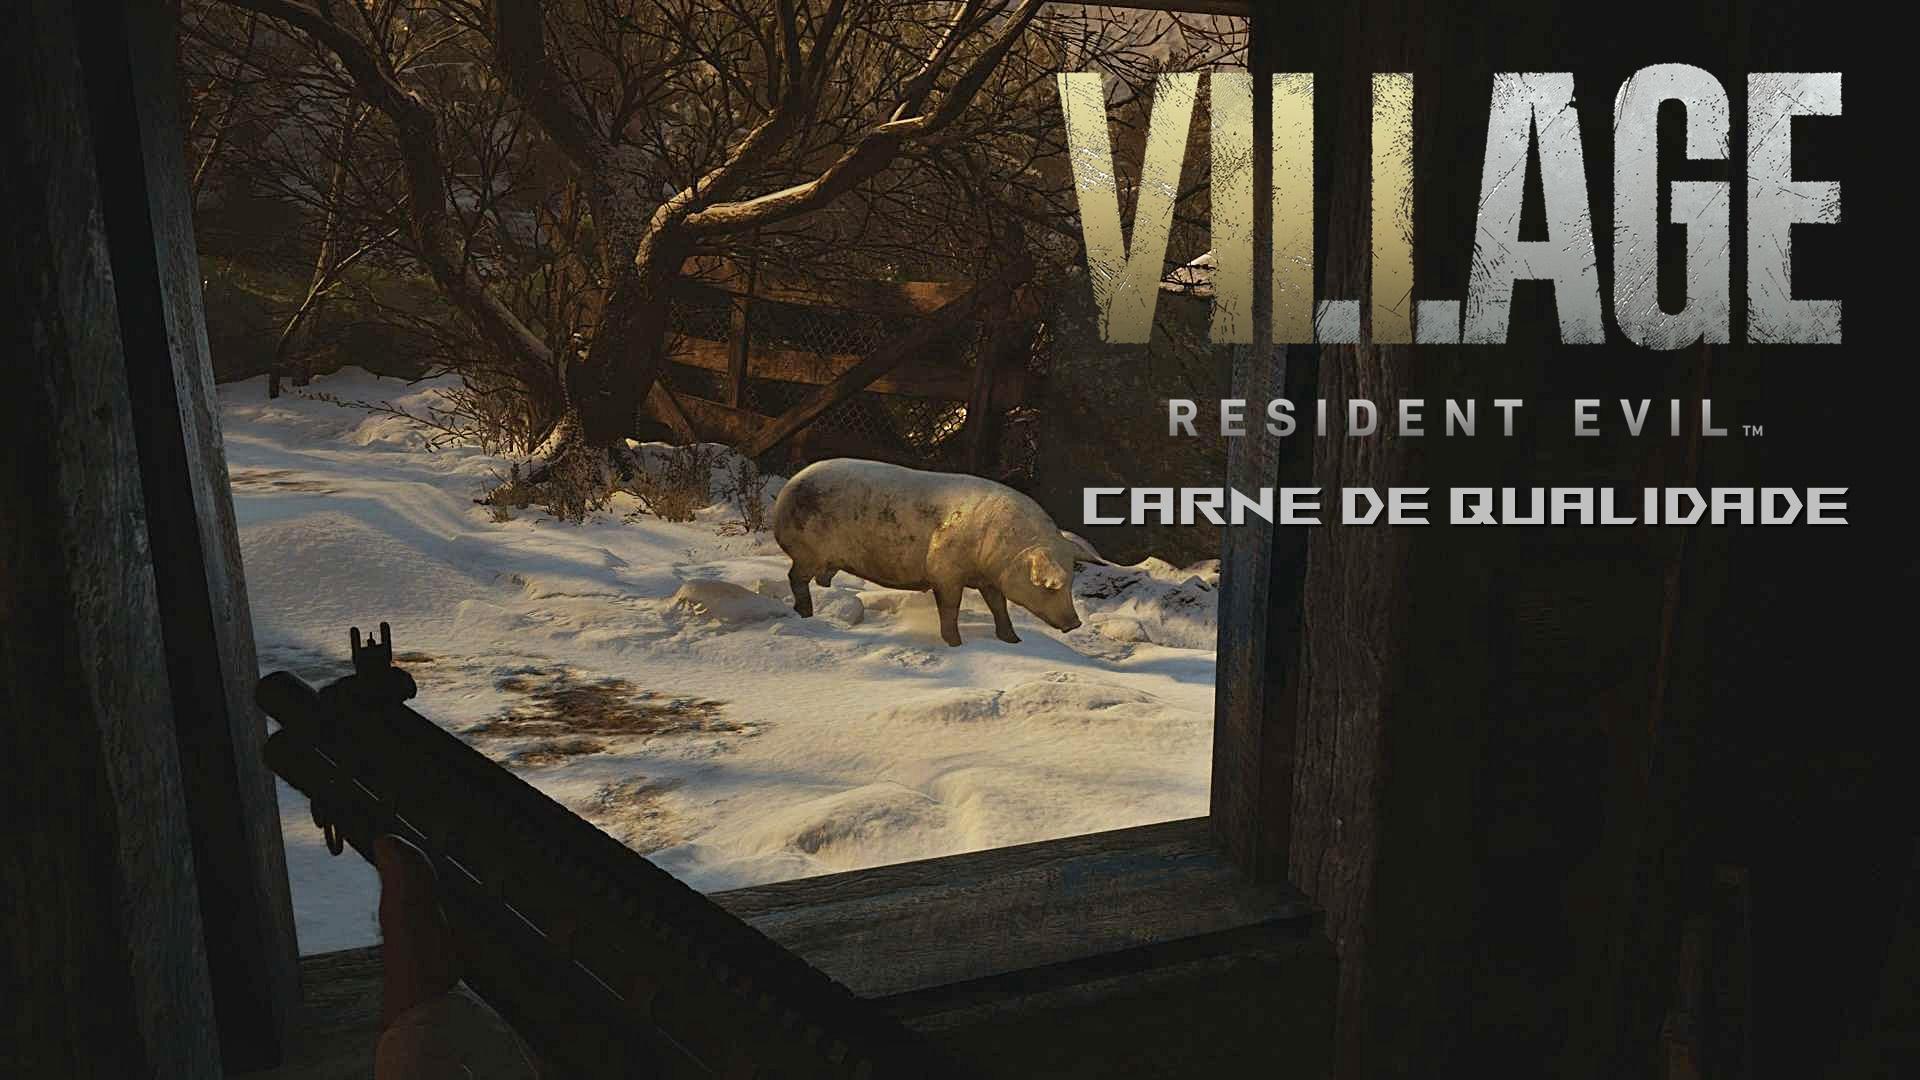 Resident Evil 8 Village - Como Obter Carne de Qualidade